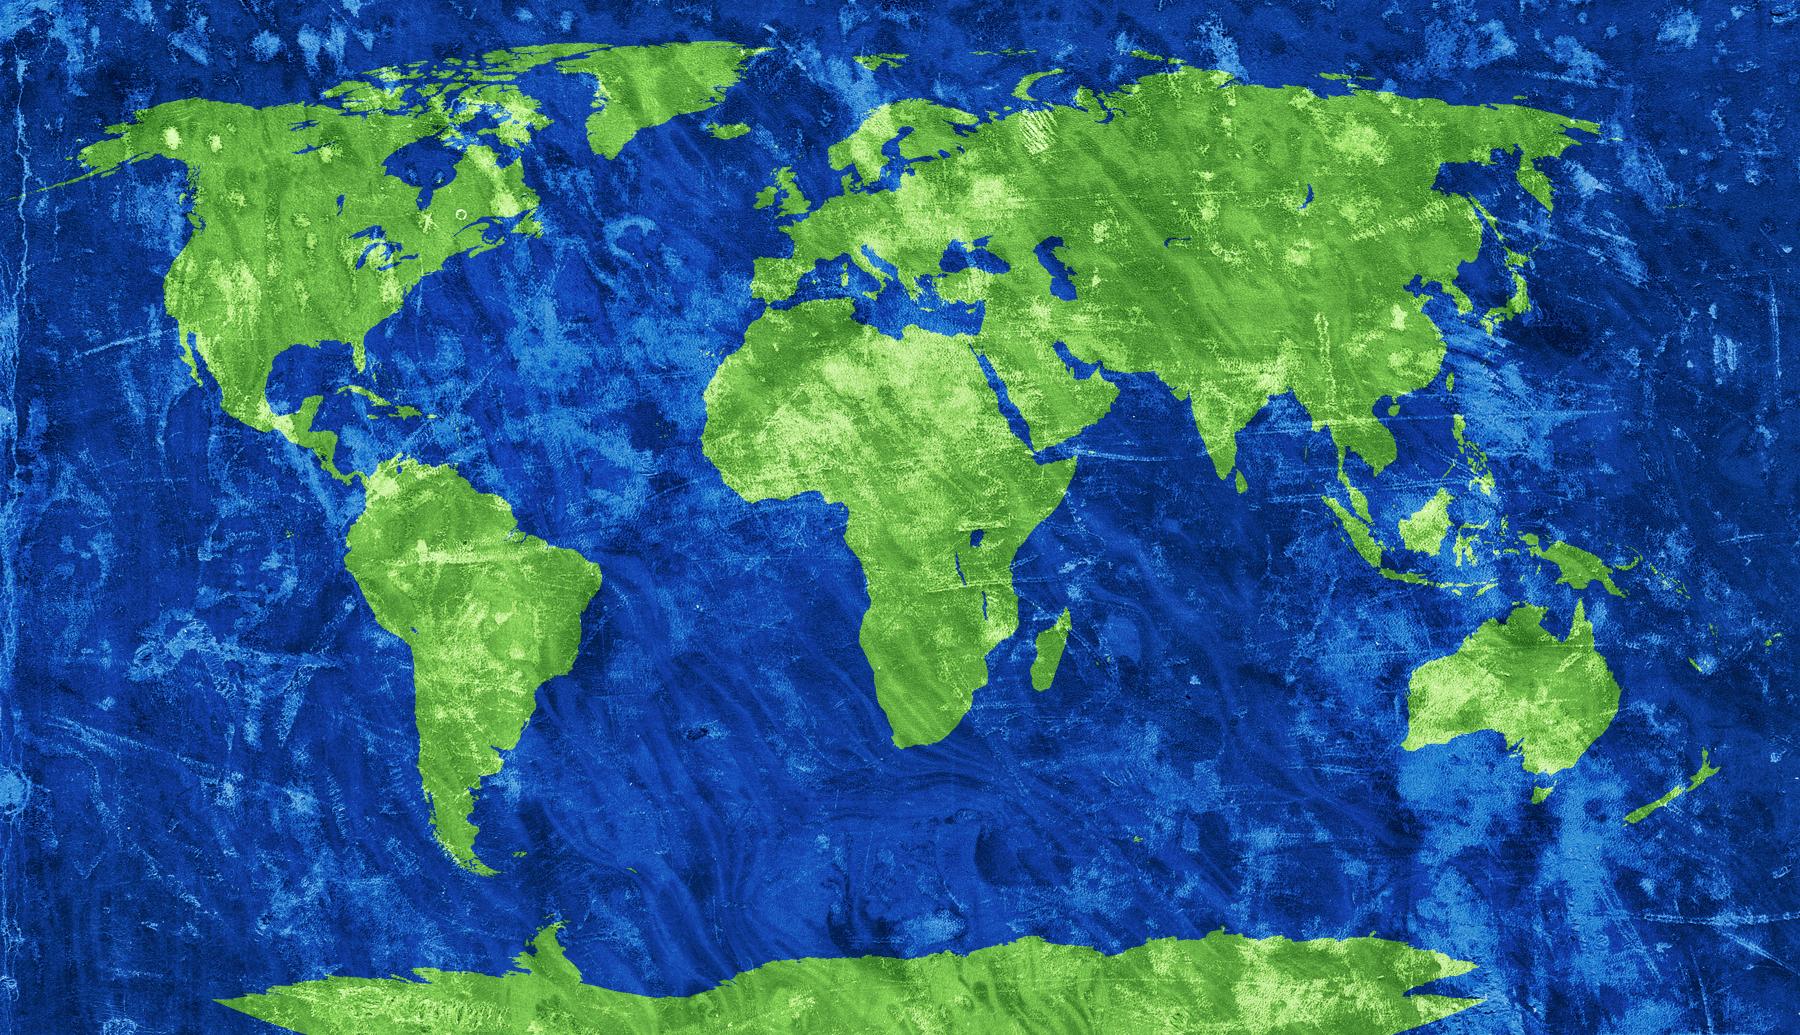 World Grunge Map, Africa, Rough, Retro, Resource, HQ Photo